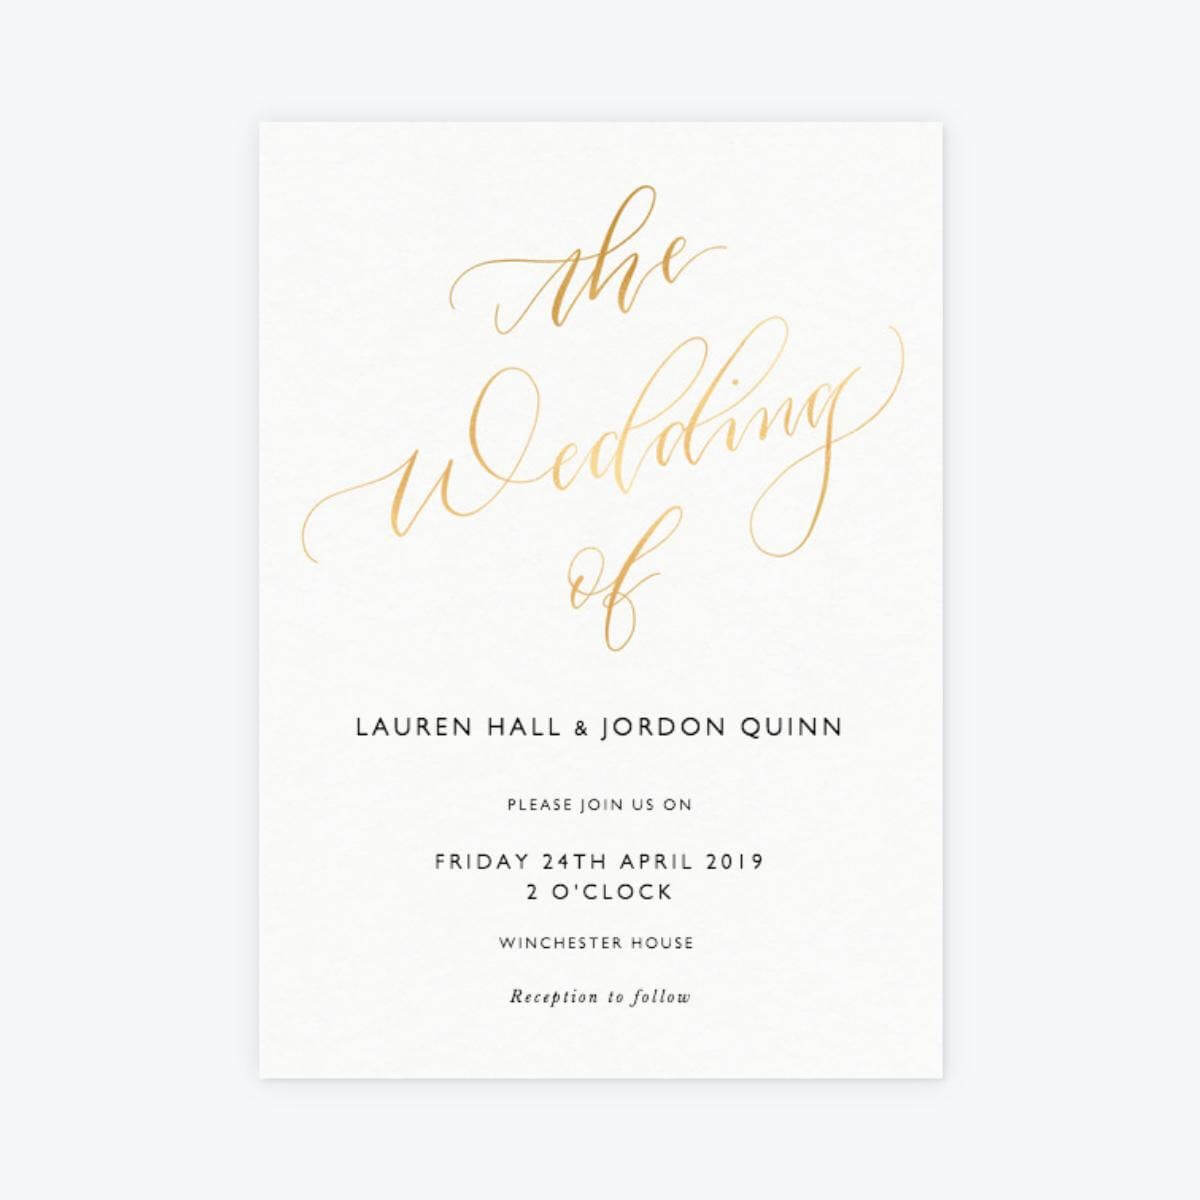 044 Wedding Registry Insert Card Template Ideas Hotel Cards Inside Wedding Hotel Information Card Template